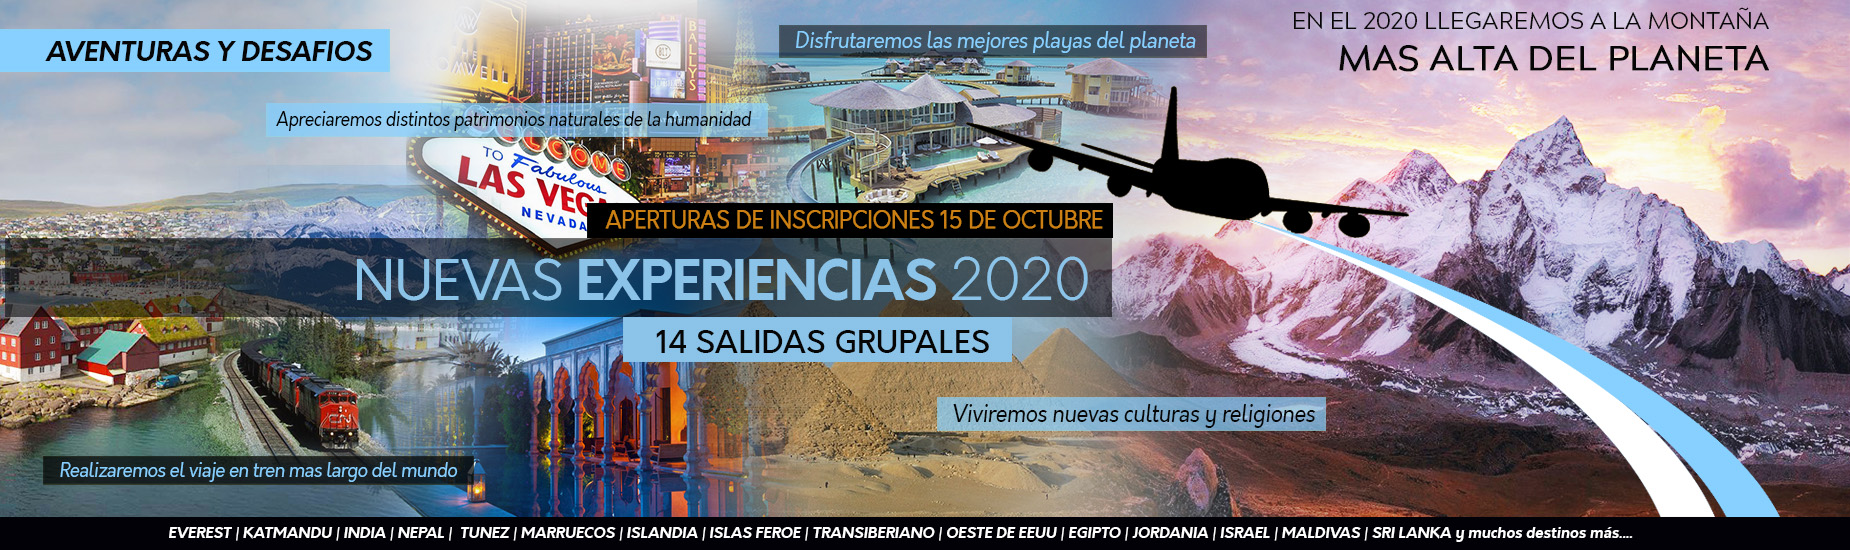 Viajes al exterior 2020